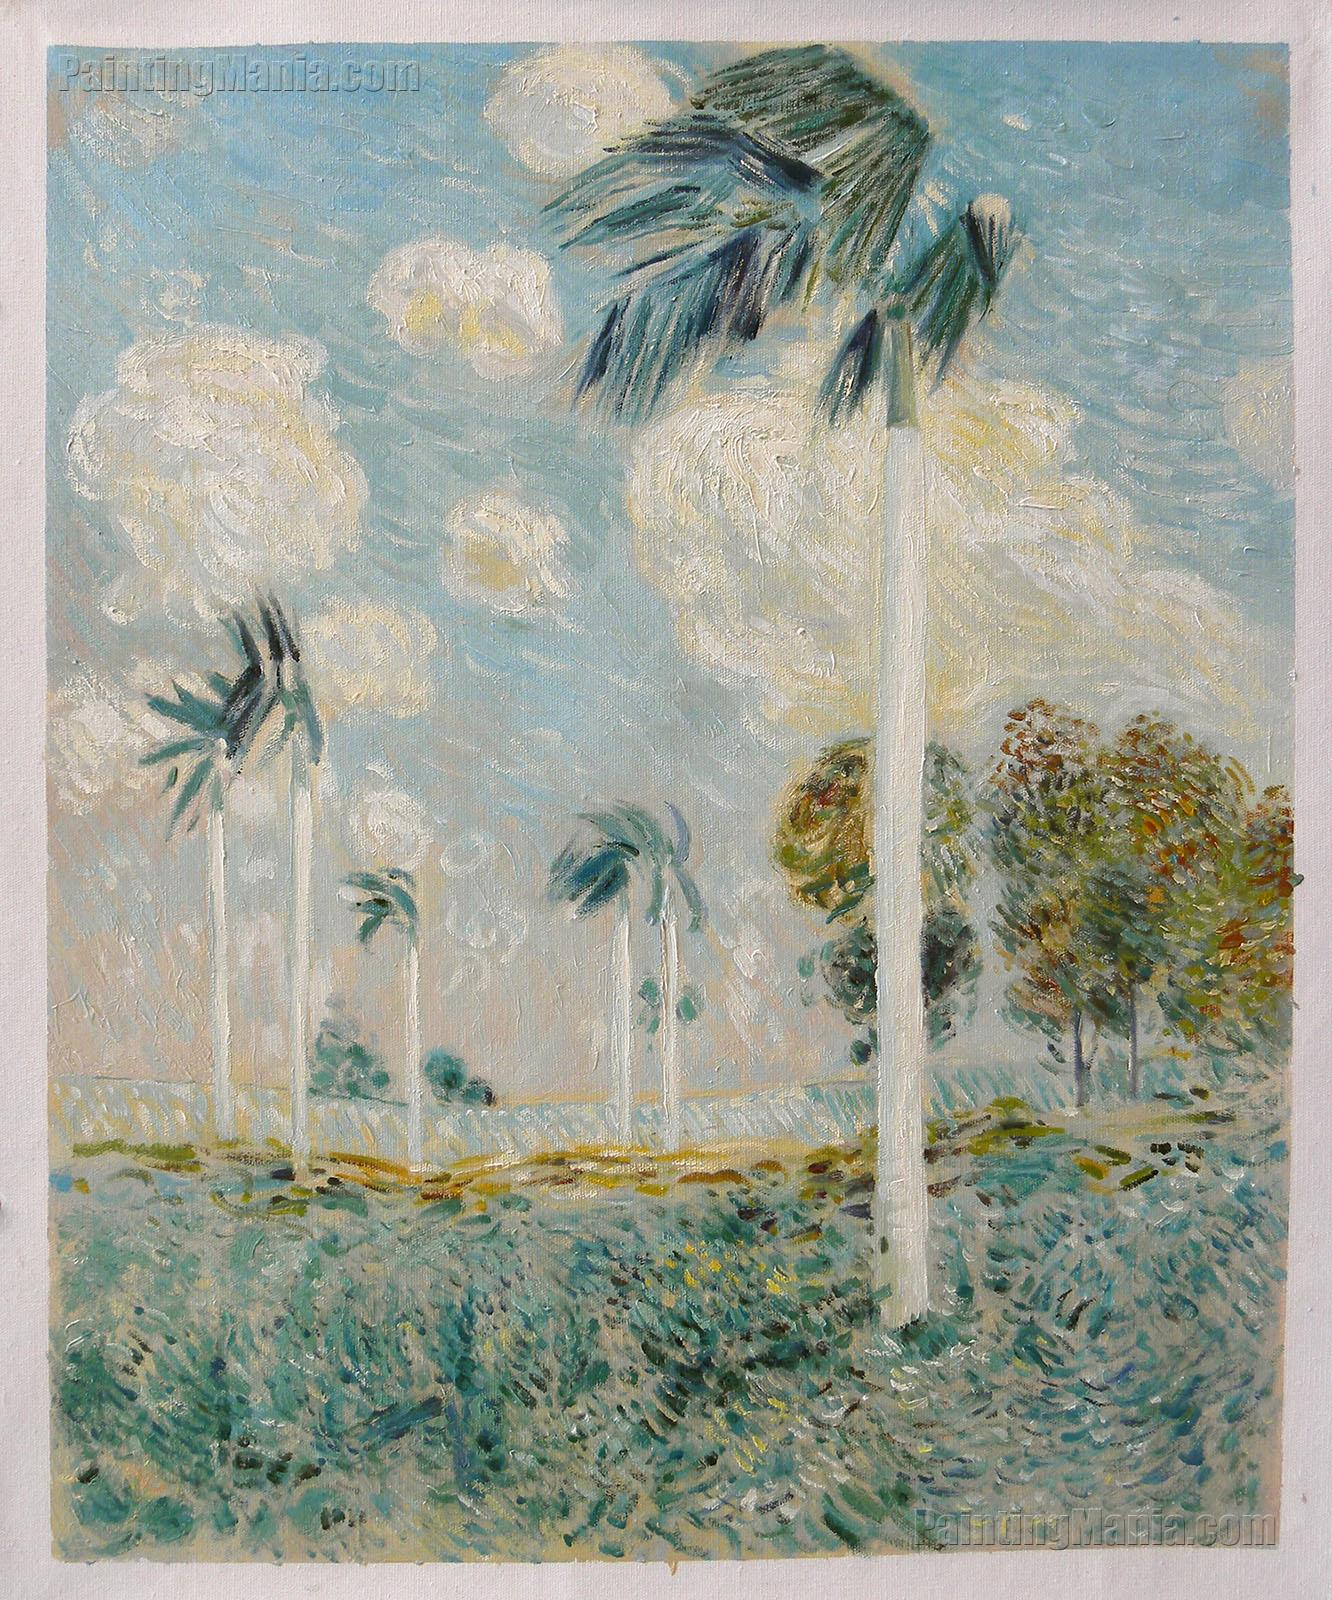 Royal Palms, Melena, Cuba